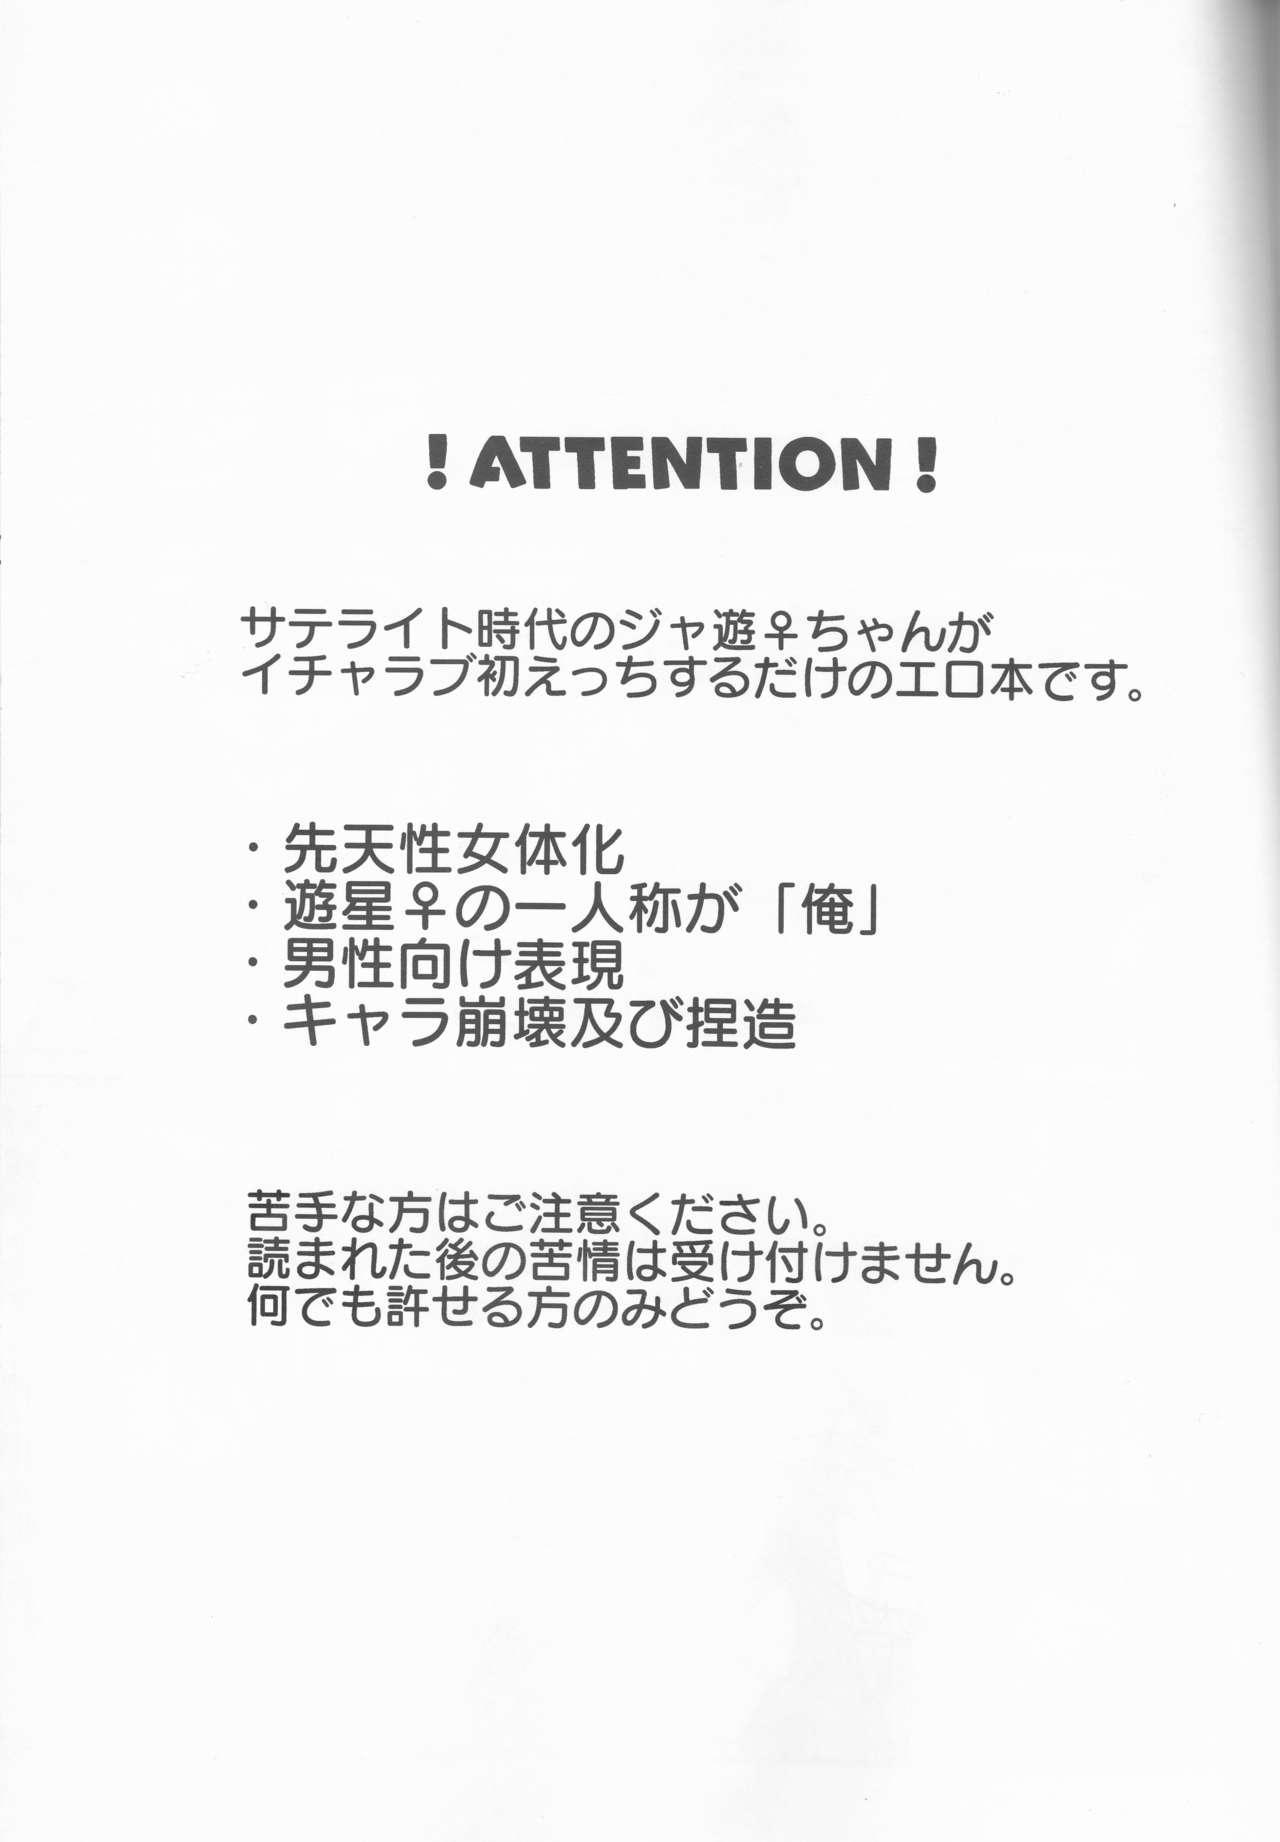 (Chou Ore no Turn 2019) [KINOPOTION (Take Nameko)] King (Mi) to Yusei-chan ♀ (Yu-Gi-Oh! 5D's) 2